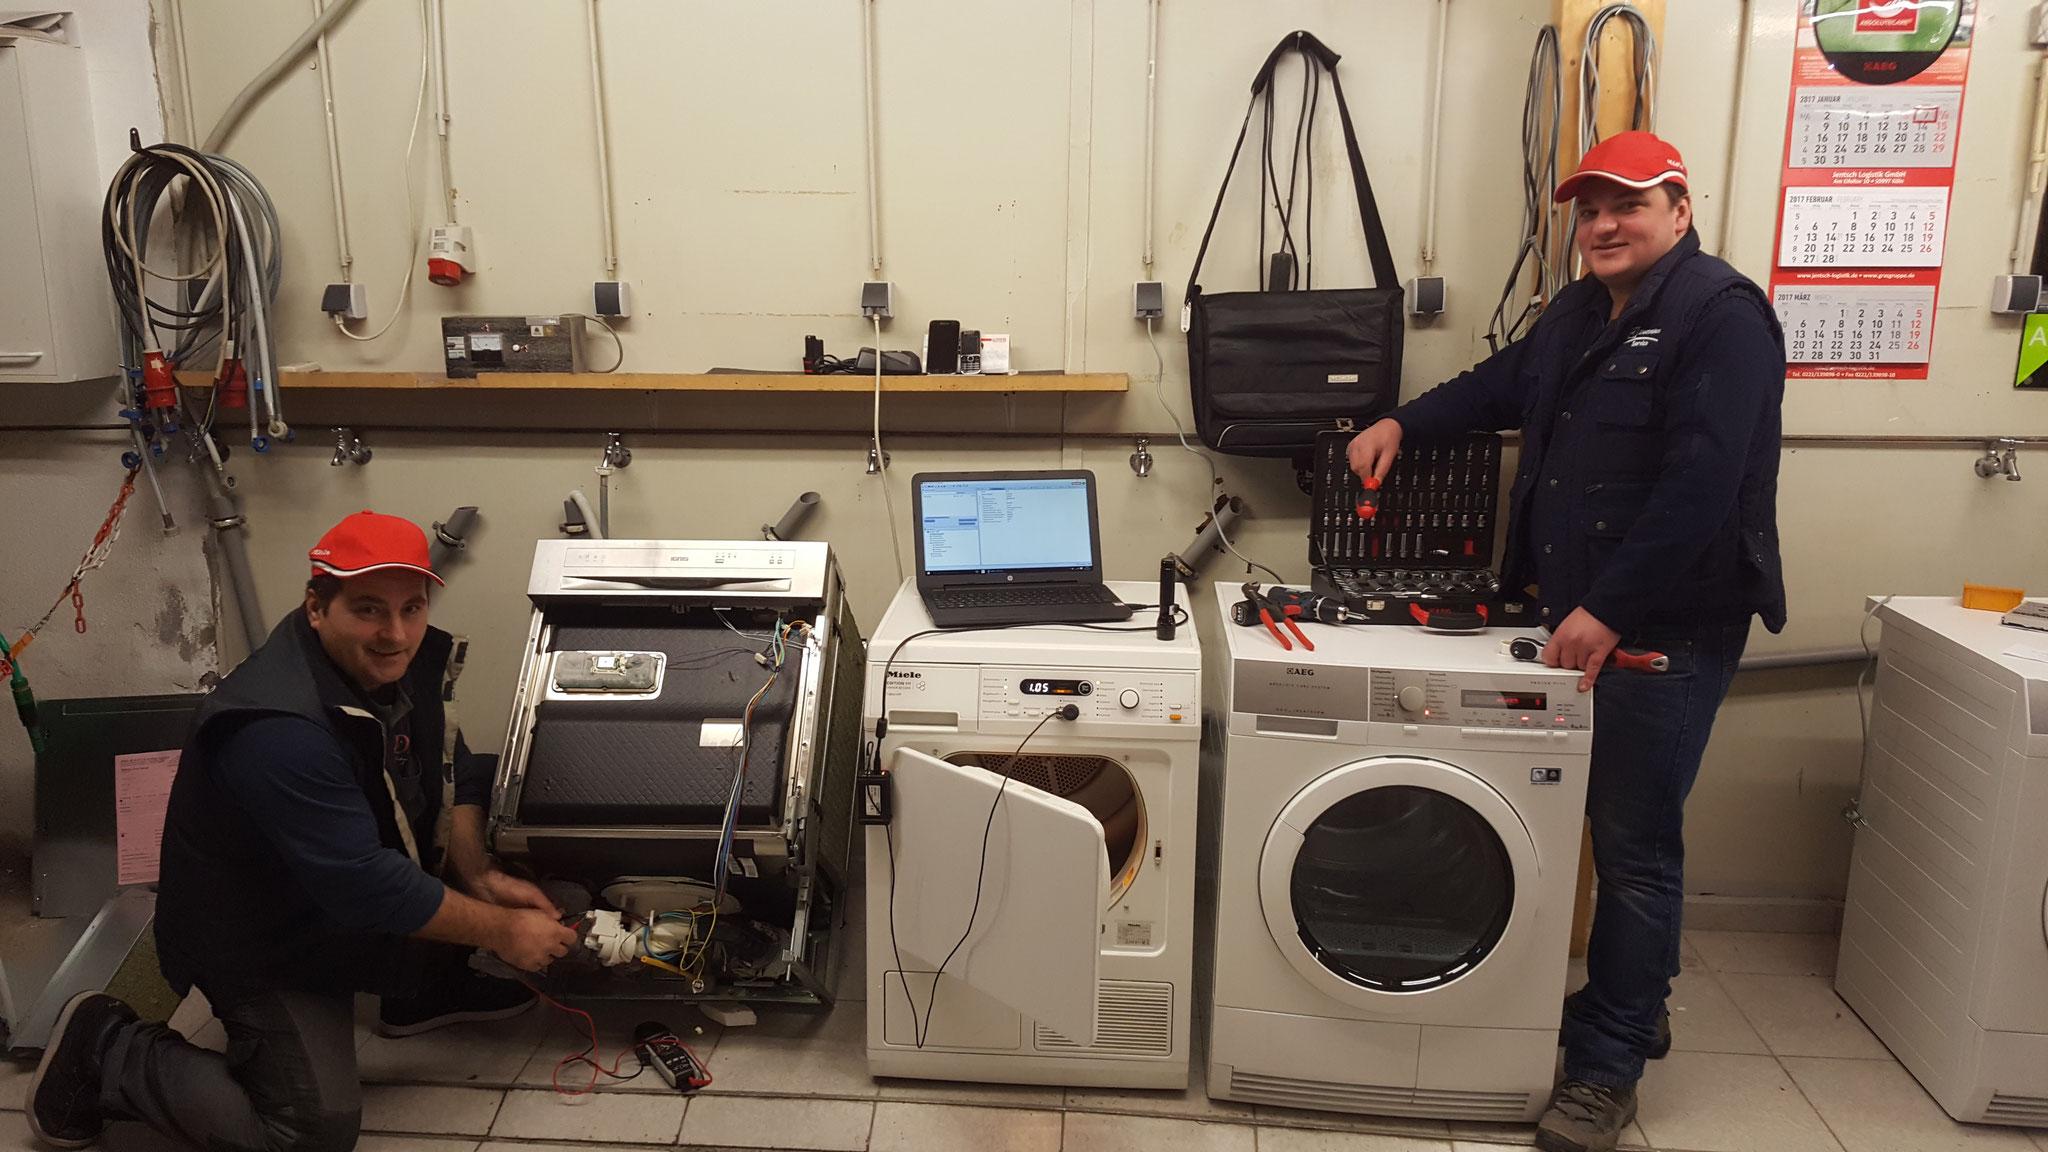 HGS Elektro Elektrogeräte Kundendienst seit 1986 in Köln